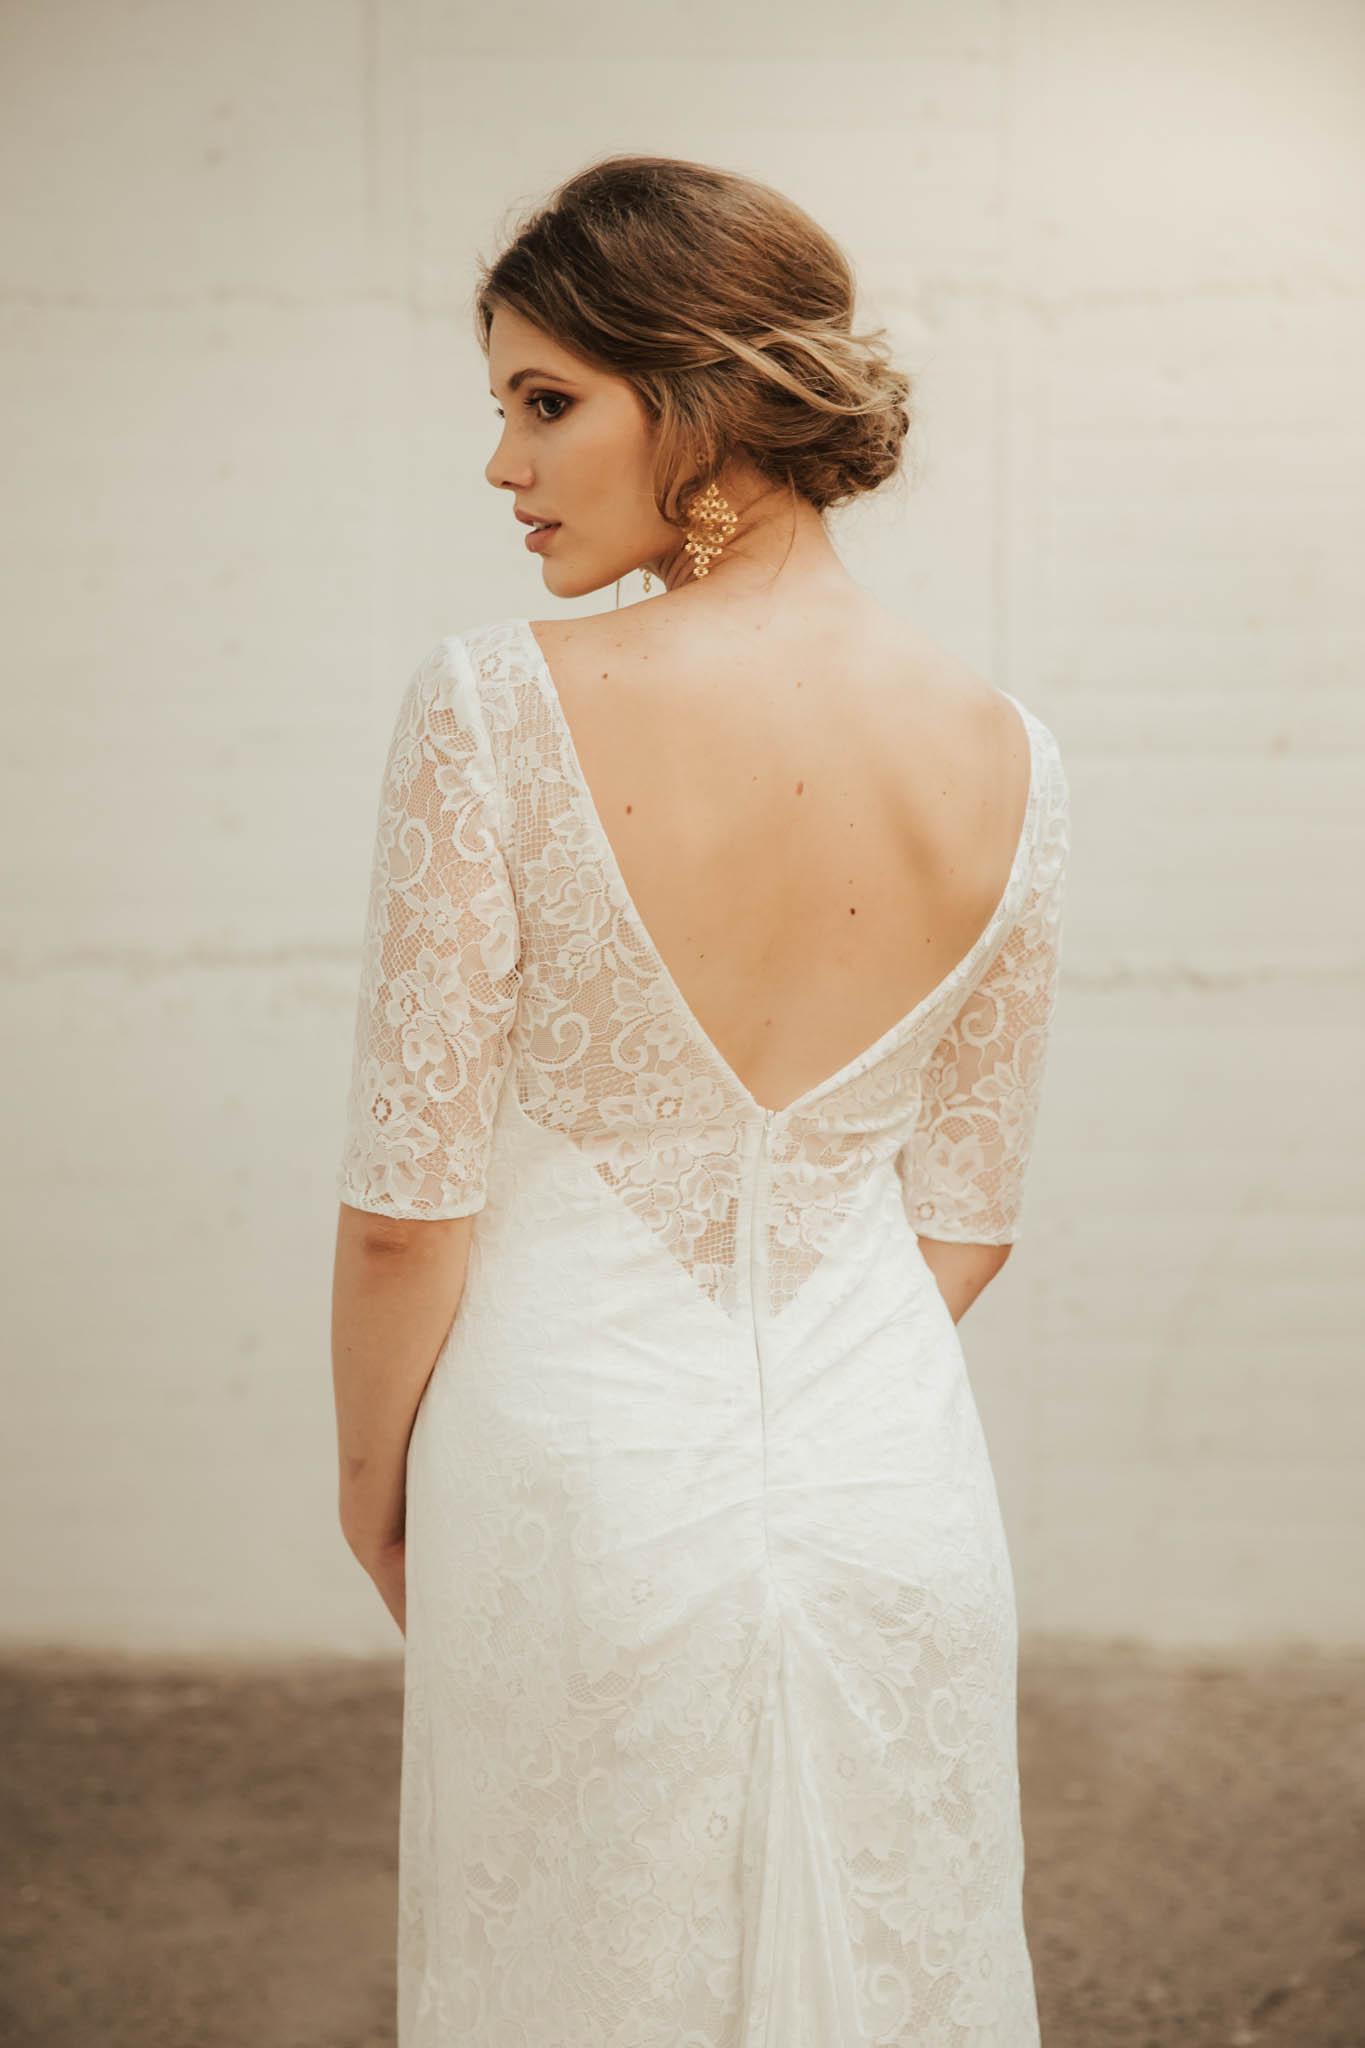 Lainee Hermsen Iris Wedding Dress Collection - Paperswan Bride - Wedding Dress Shop - Wellington - Christchurch - New Zealand